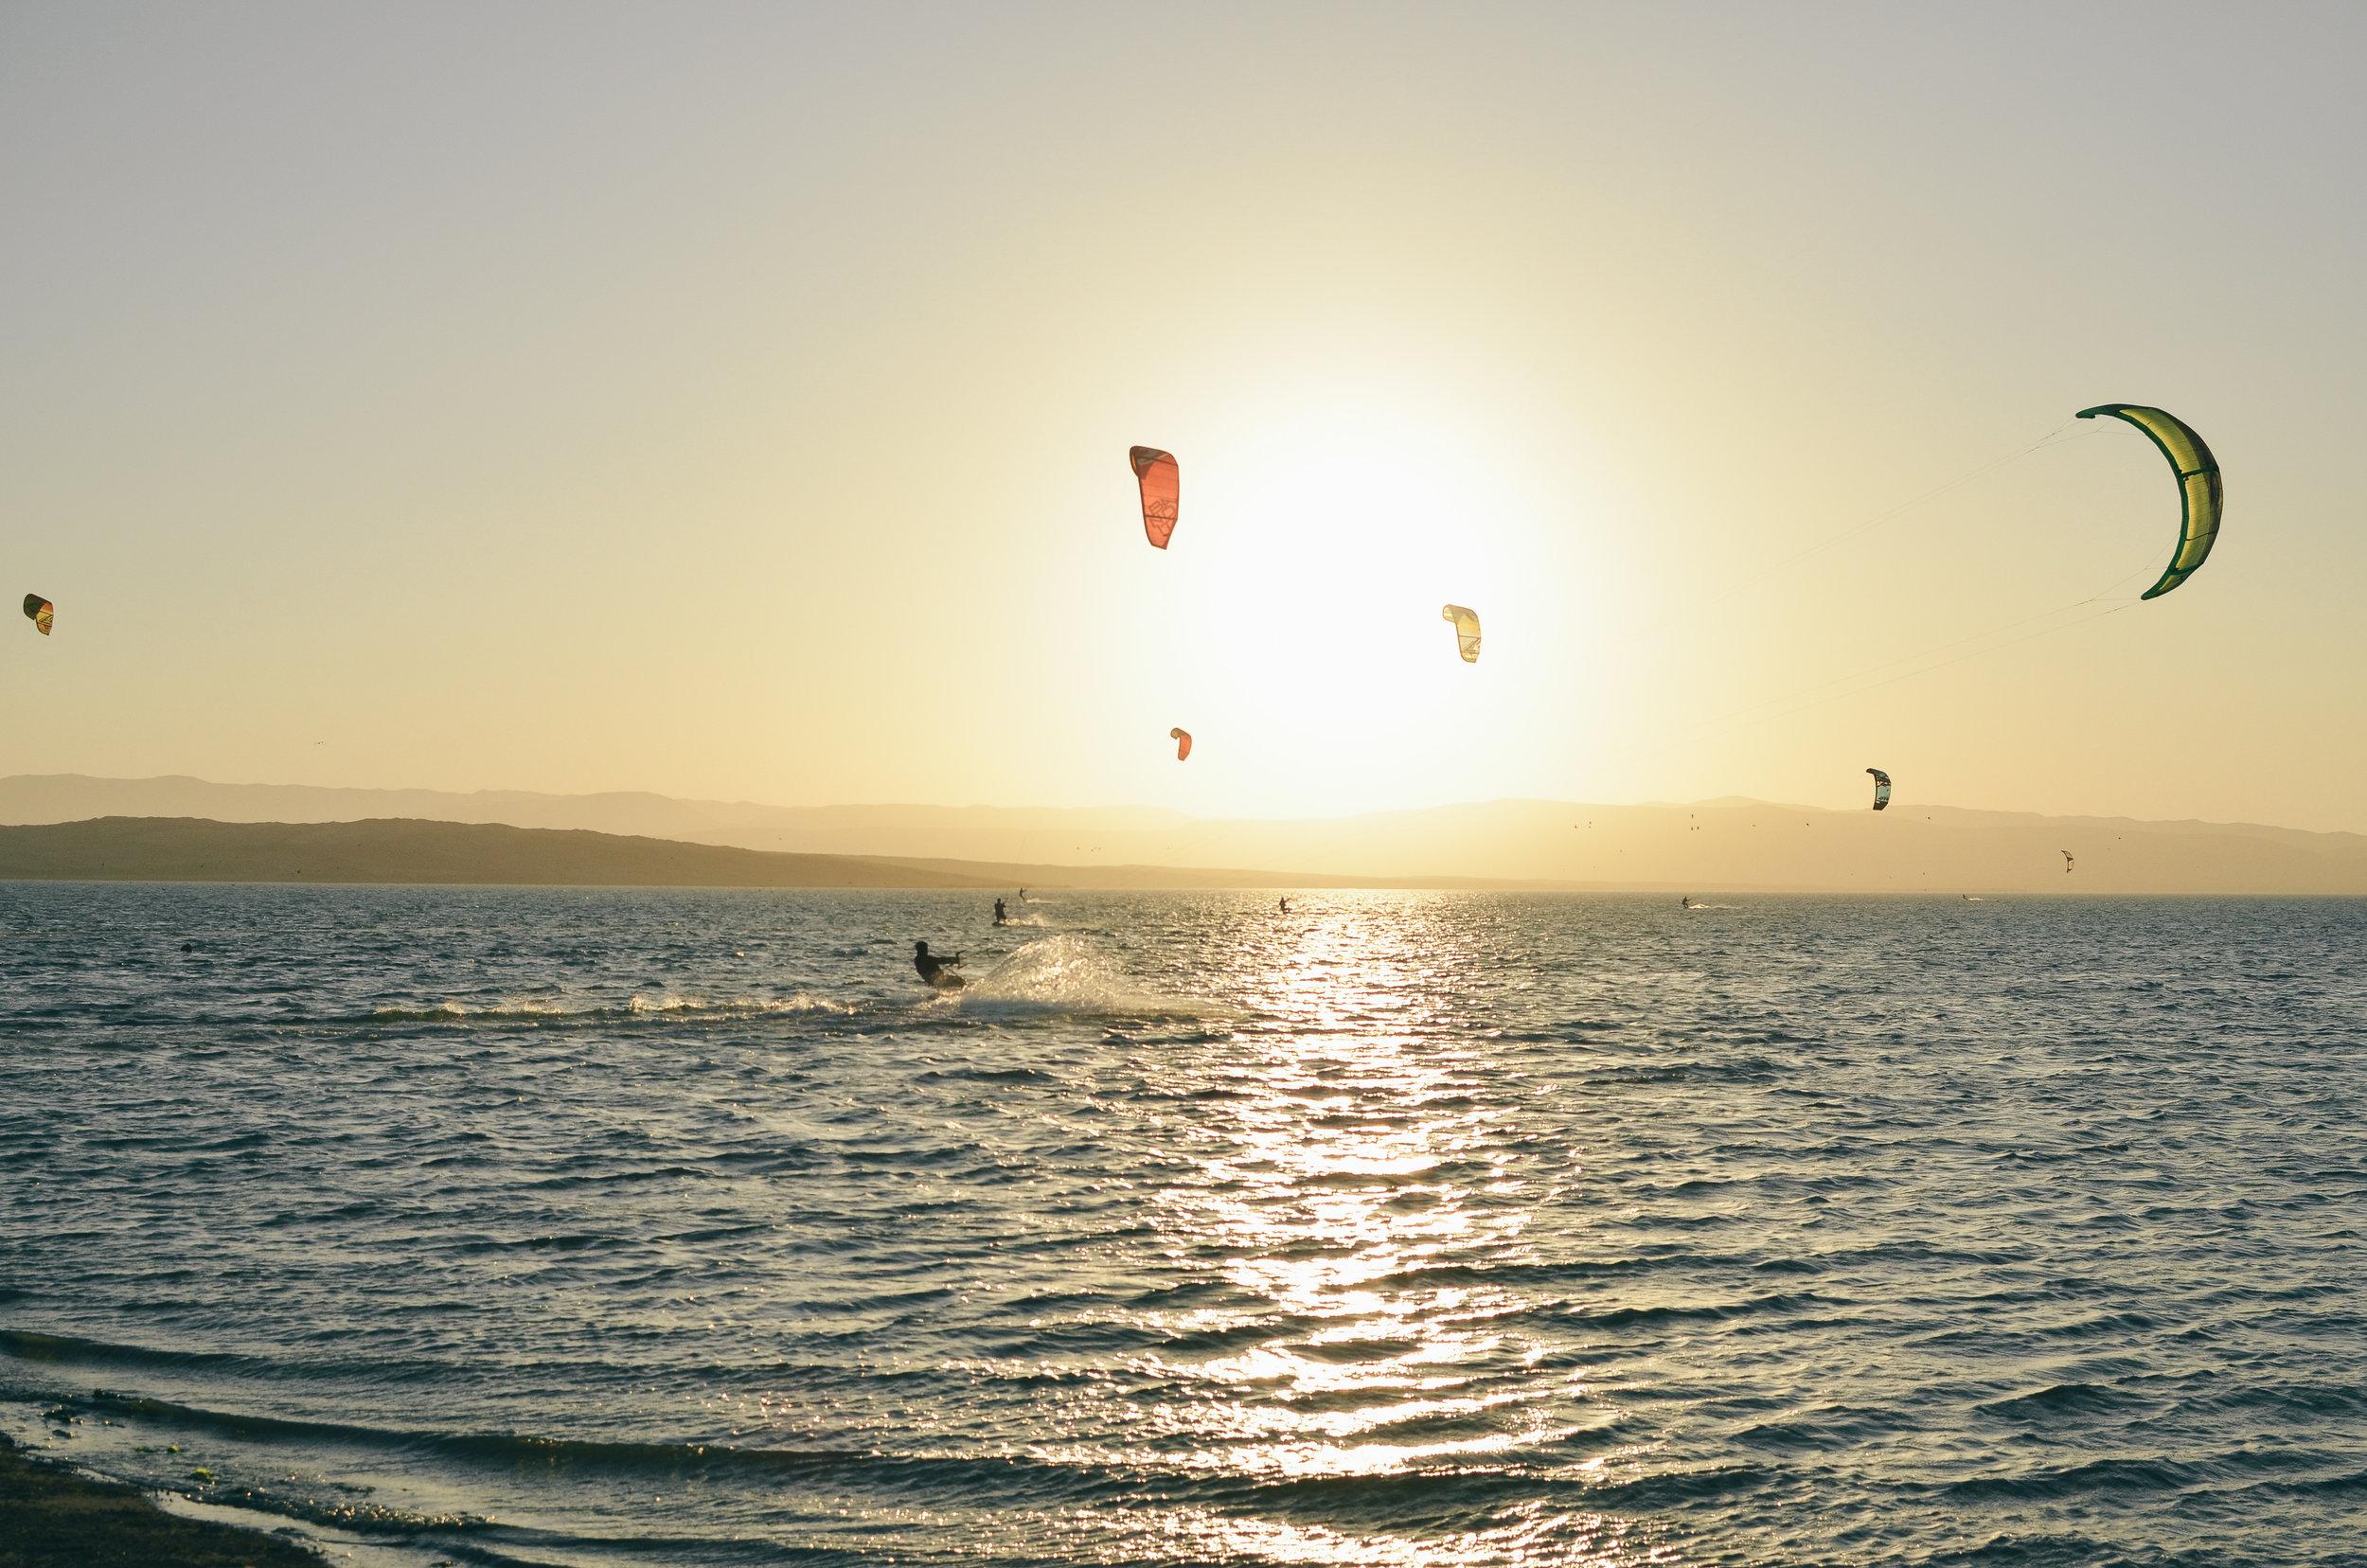 paracas+peru+travel+guide+life+on+pine_DSC_0037.jpg